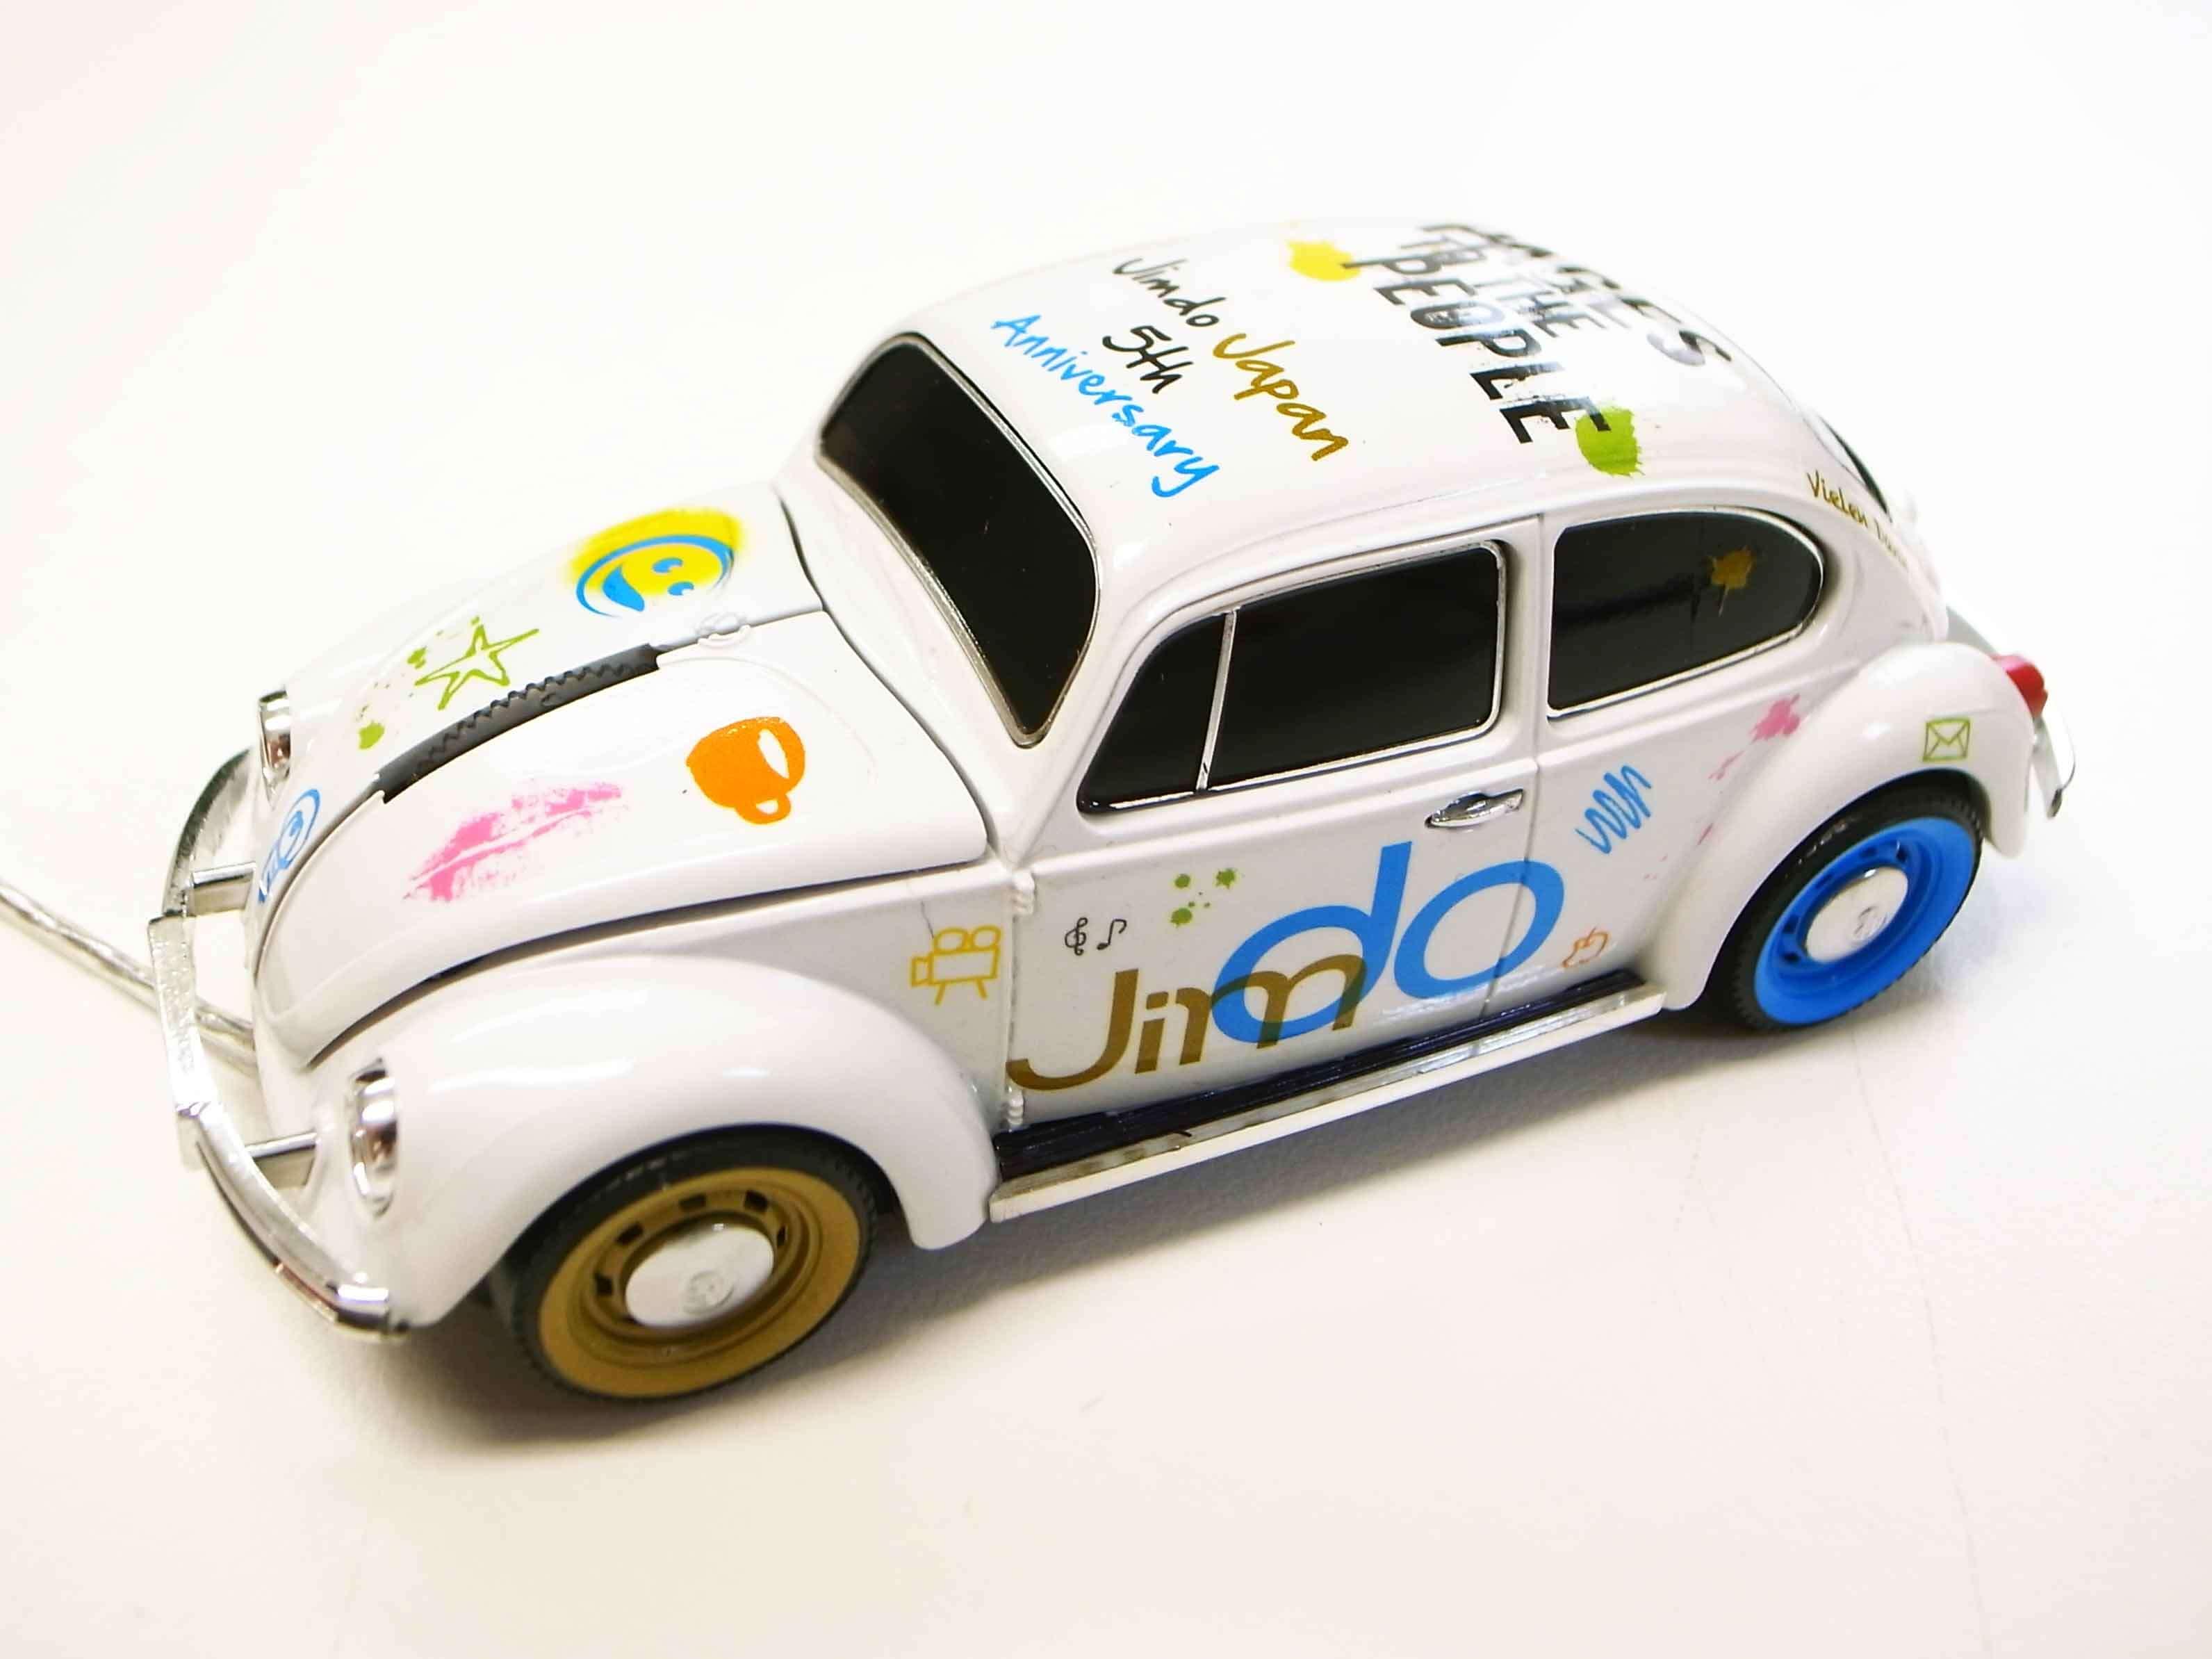 Jimdo Japan | ウェブサイトクリエイター | 5周年記念ノベルティー